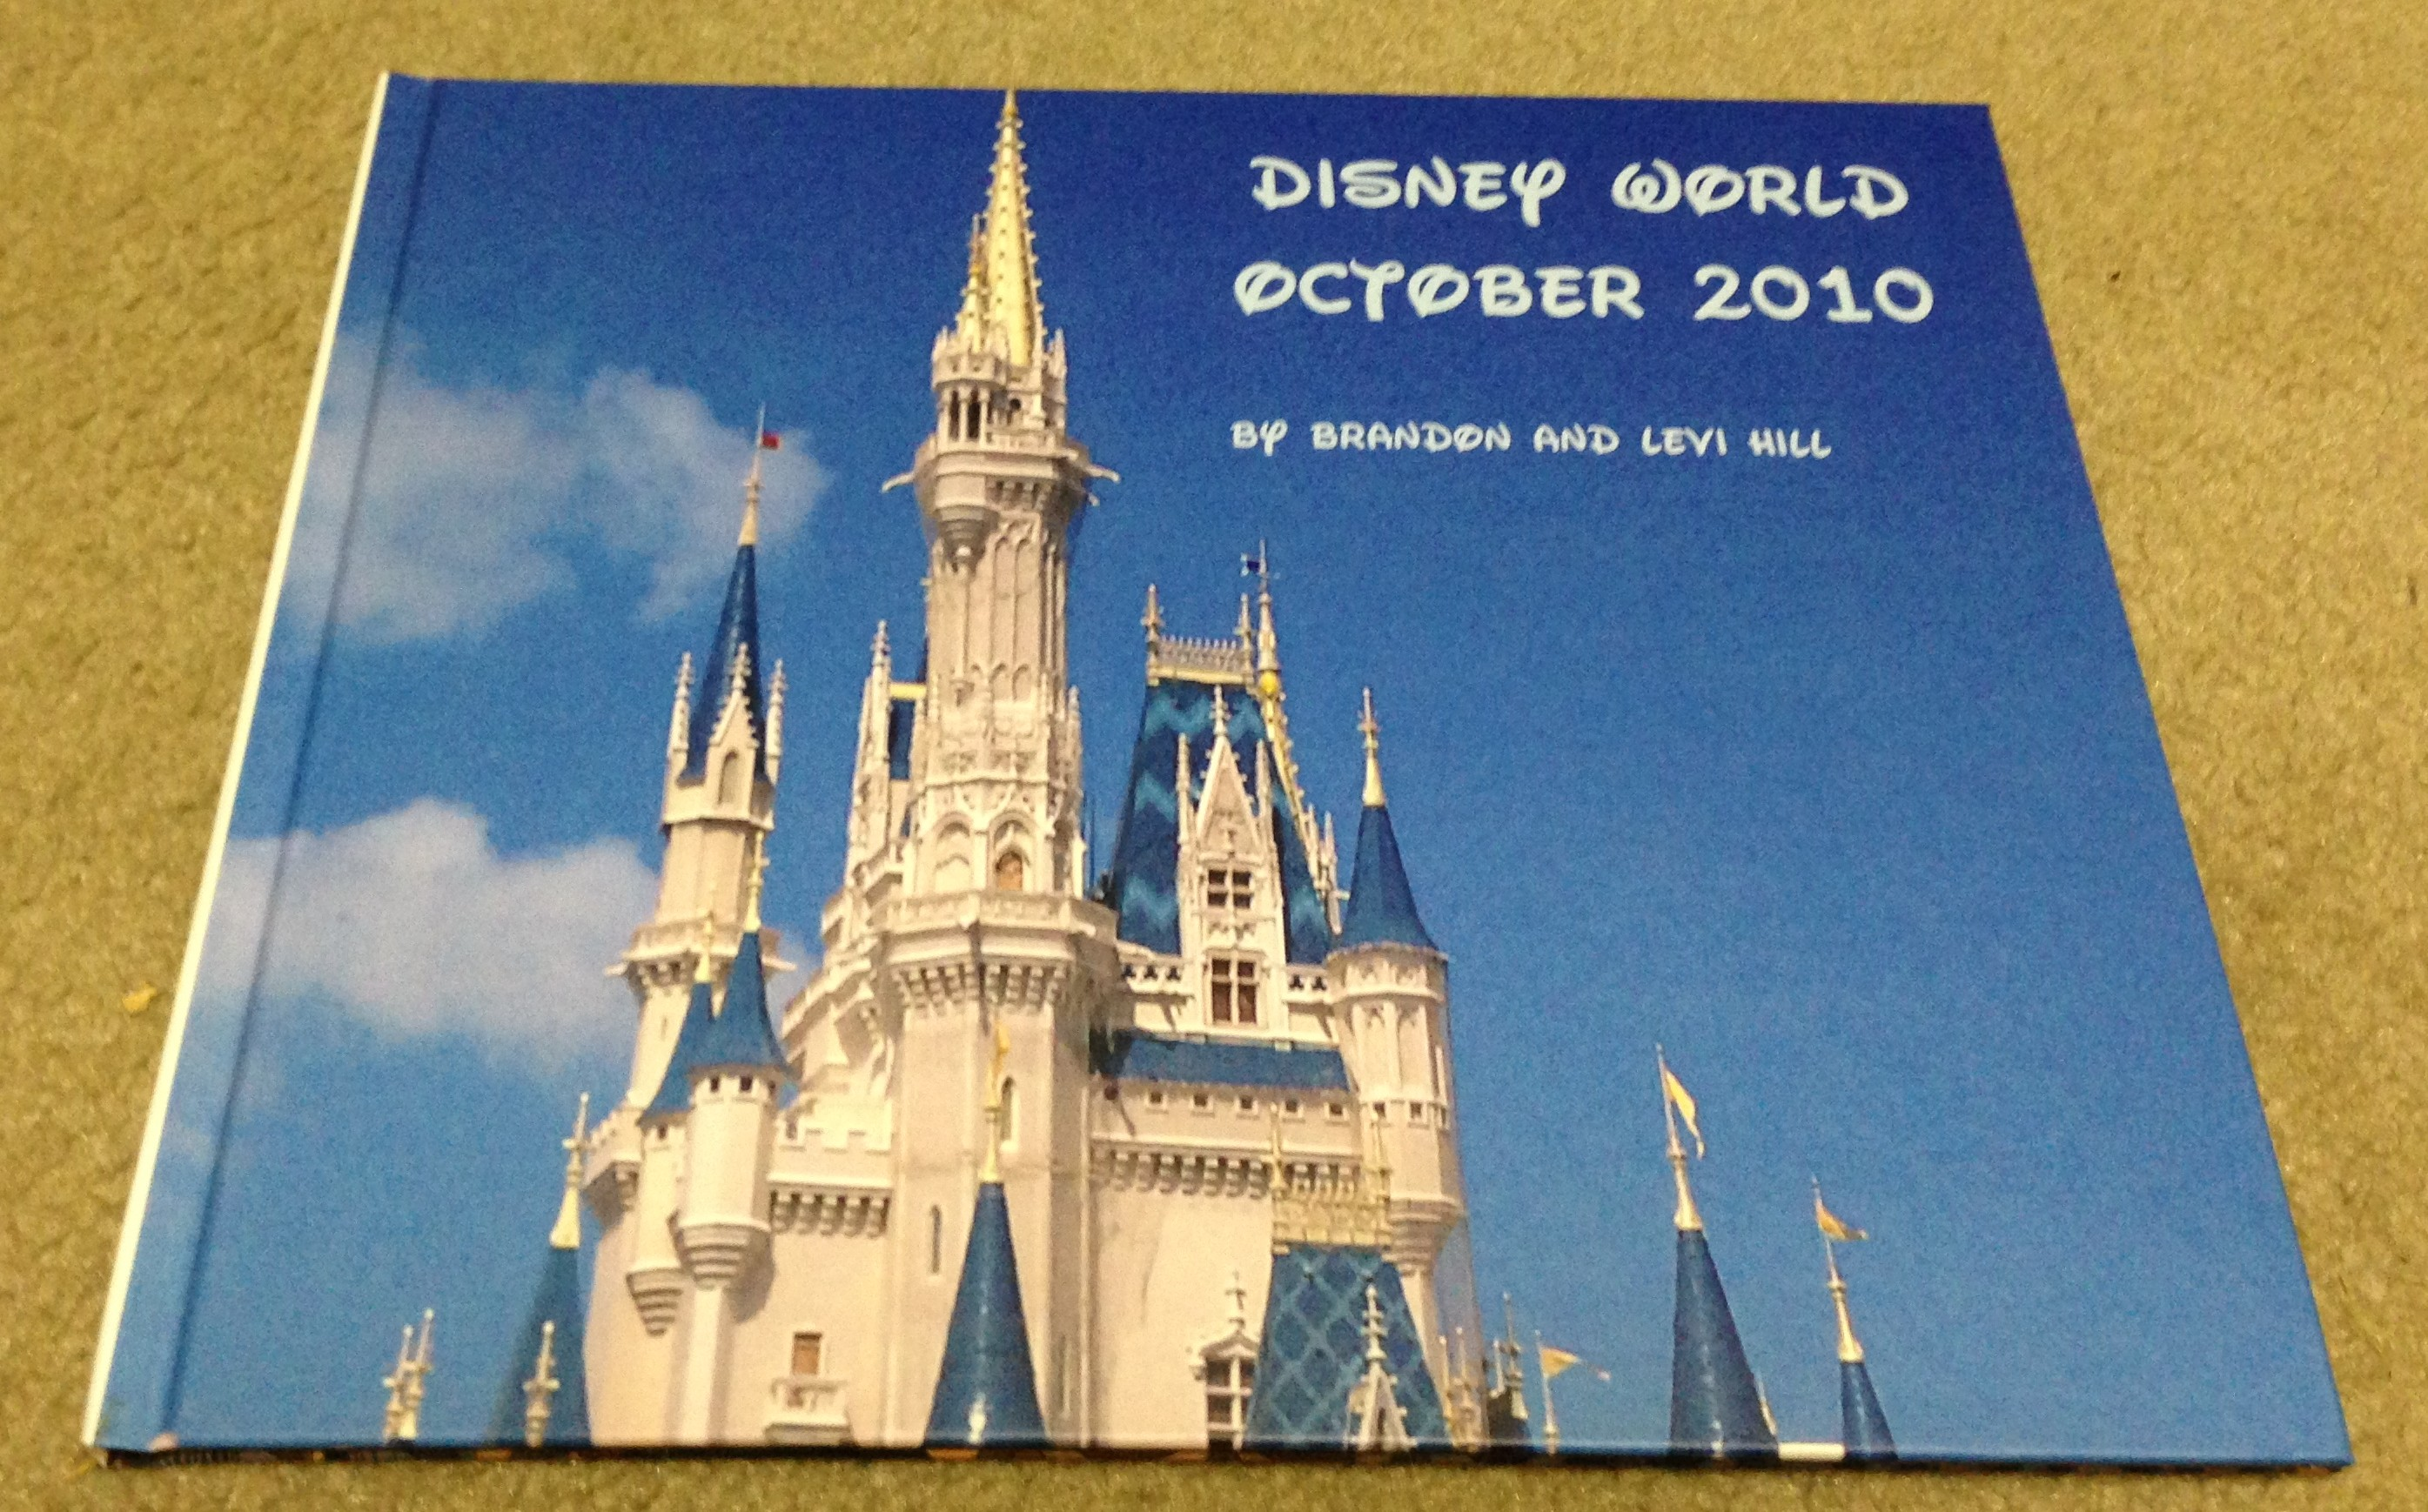 How to scrapbook disney - Disney 2010 Digital Cover